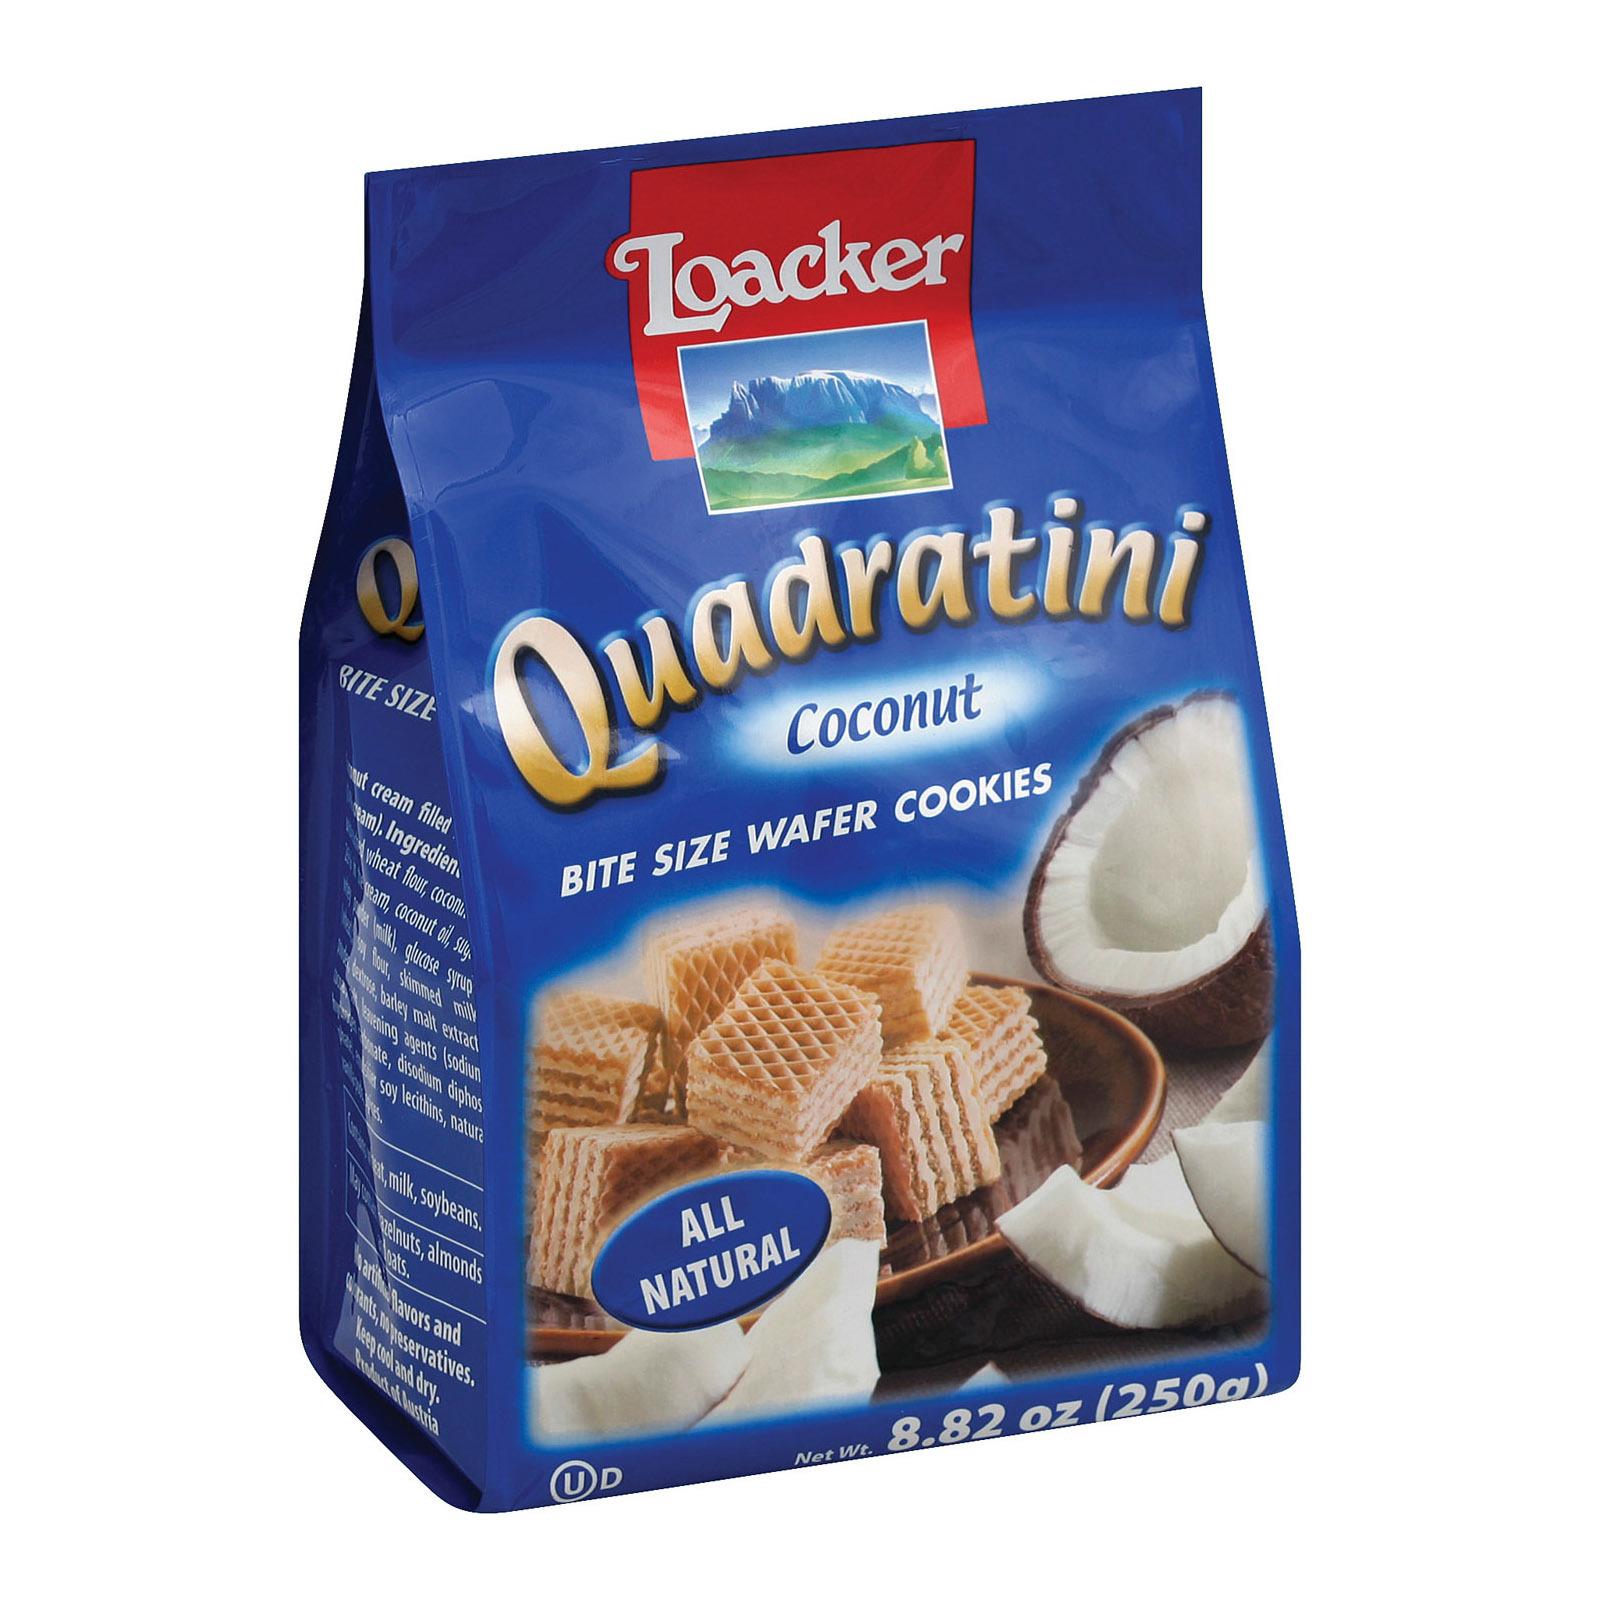 Loacker Quadratini Coconut Bite Size Wafer Cookies - Case of 8 - 8.82 oz.